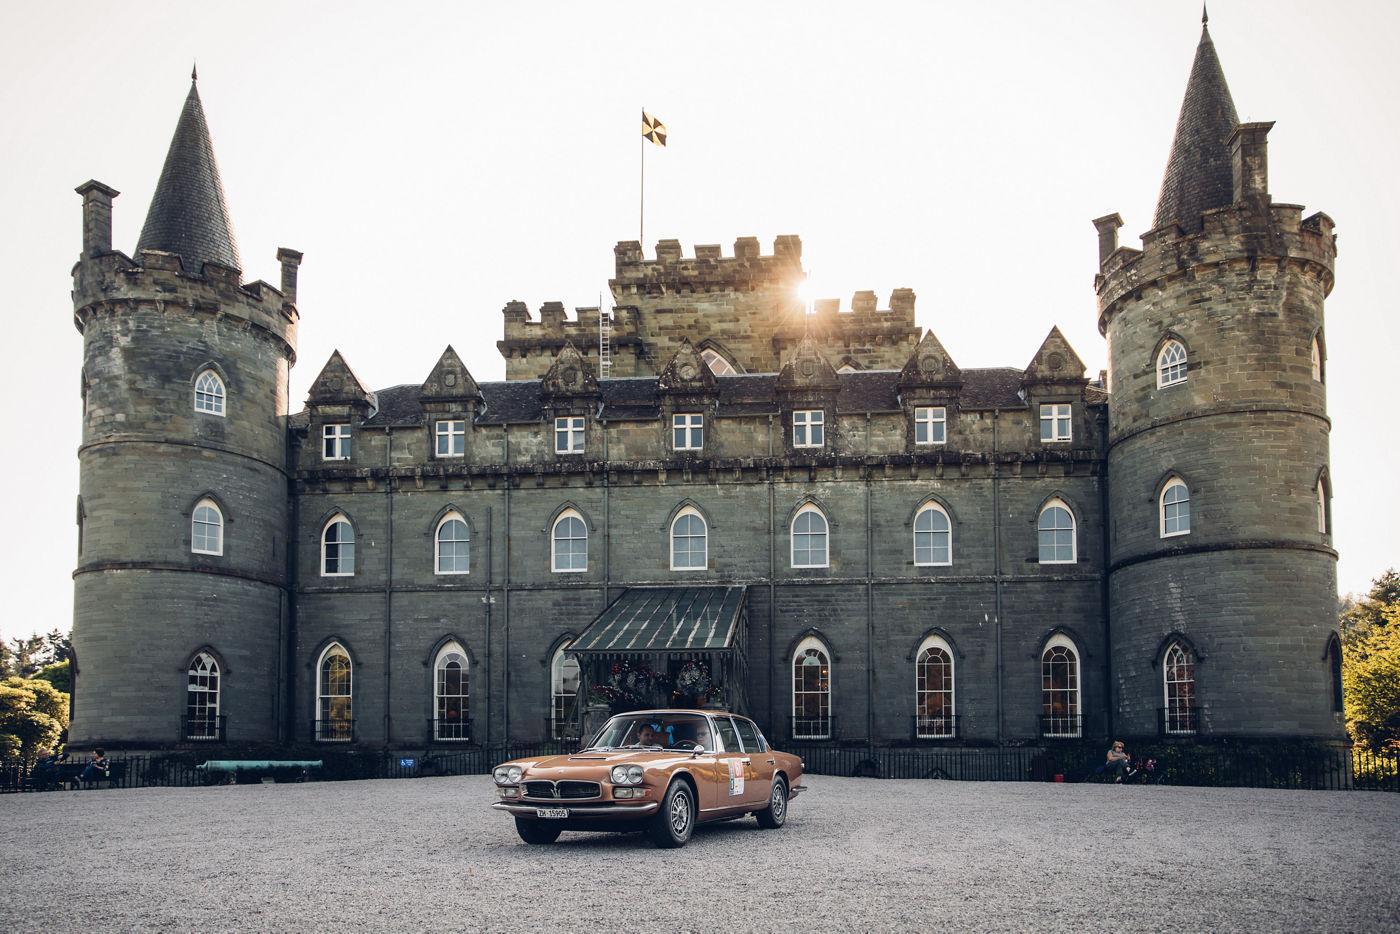 Maserati International Rally 2019 - Inveraray Castle